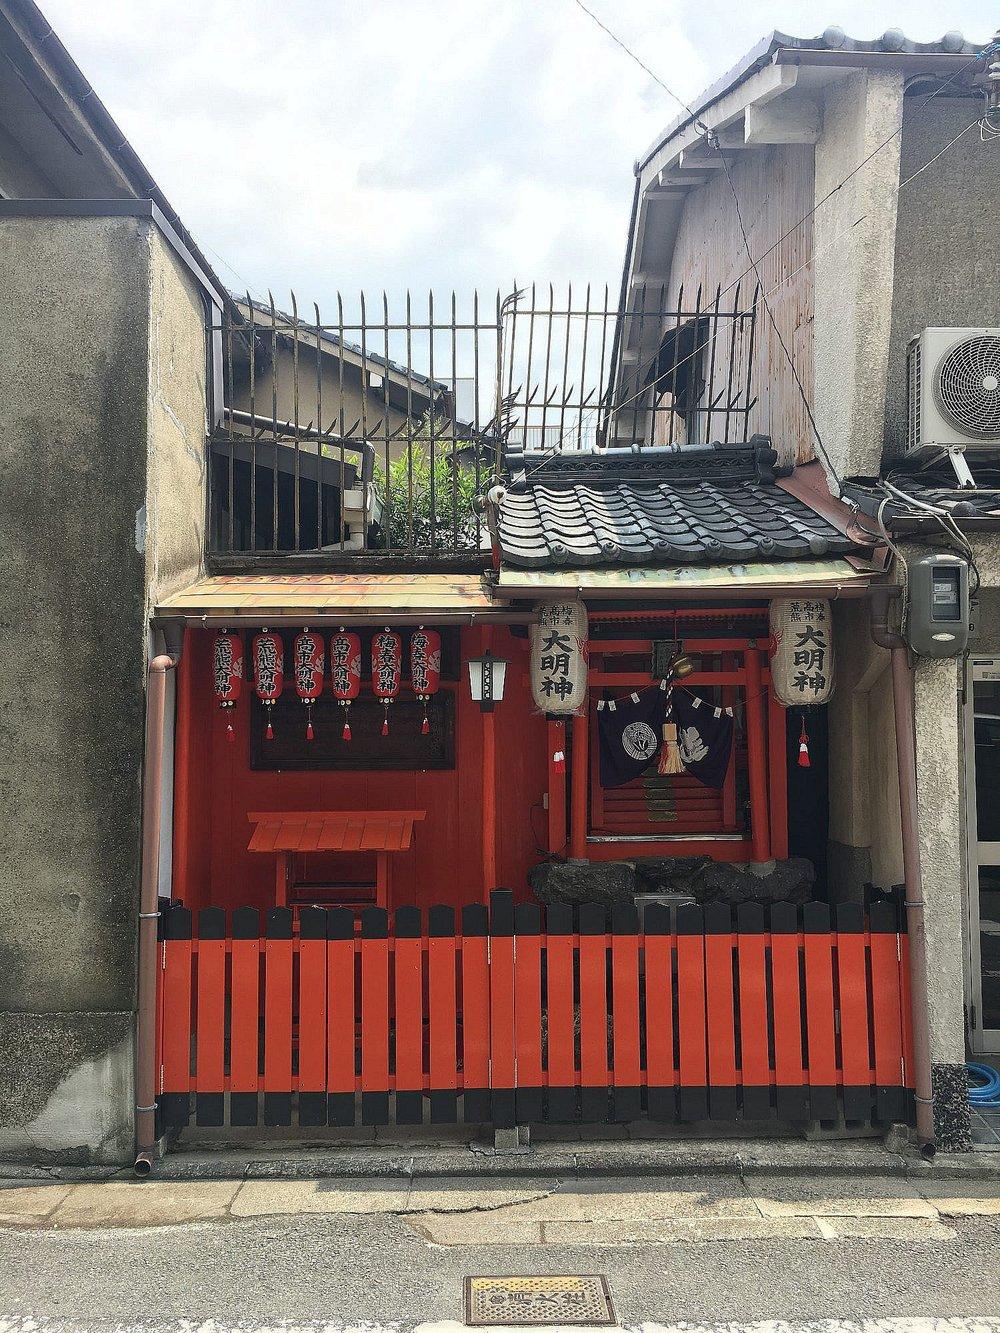 Little shrine in Kyoto